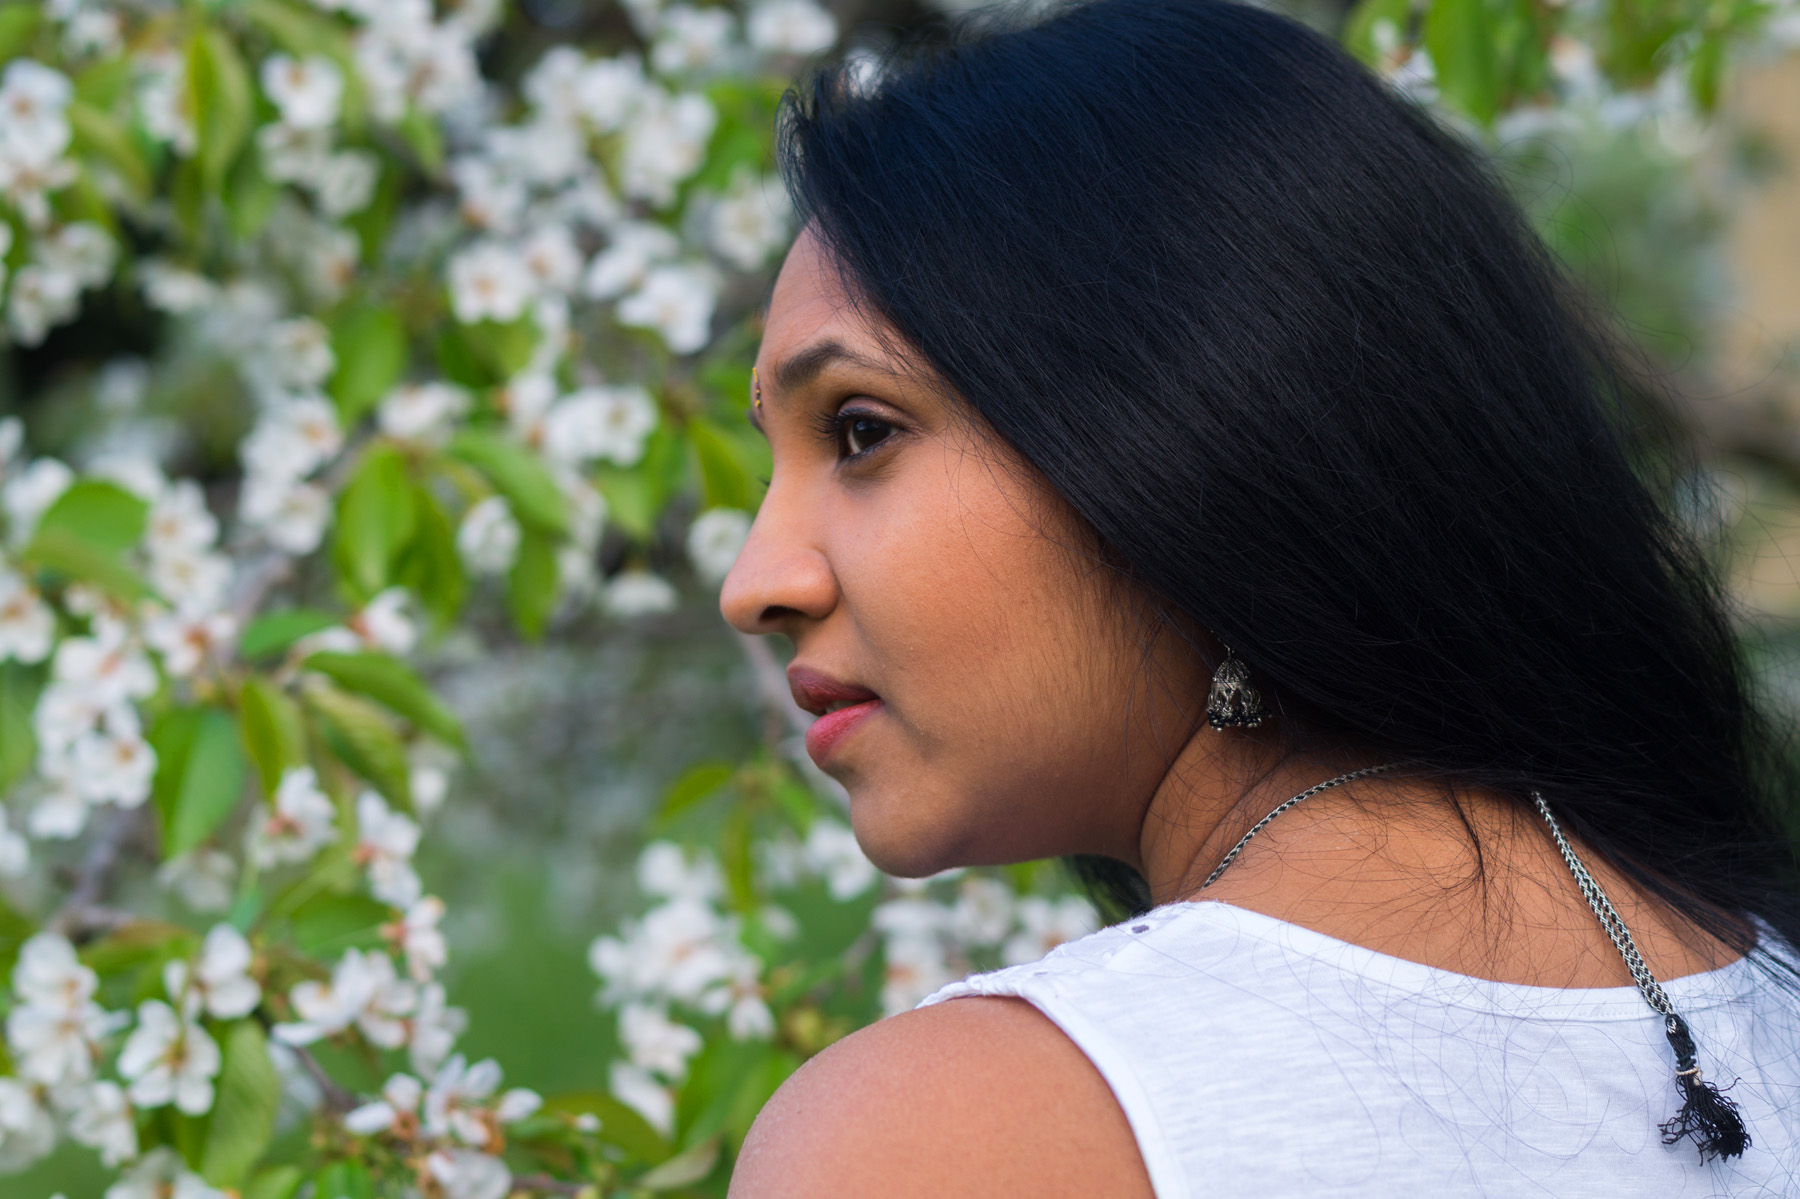 Hema_pose_ses_valises_sakura_look_blog_mode_indienne_9